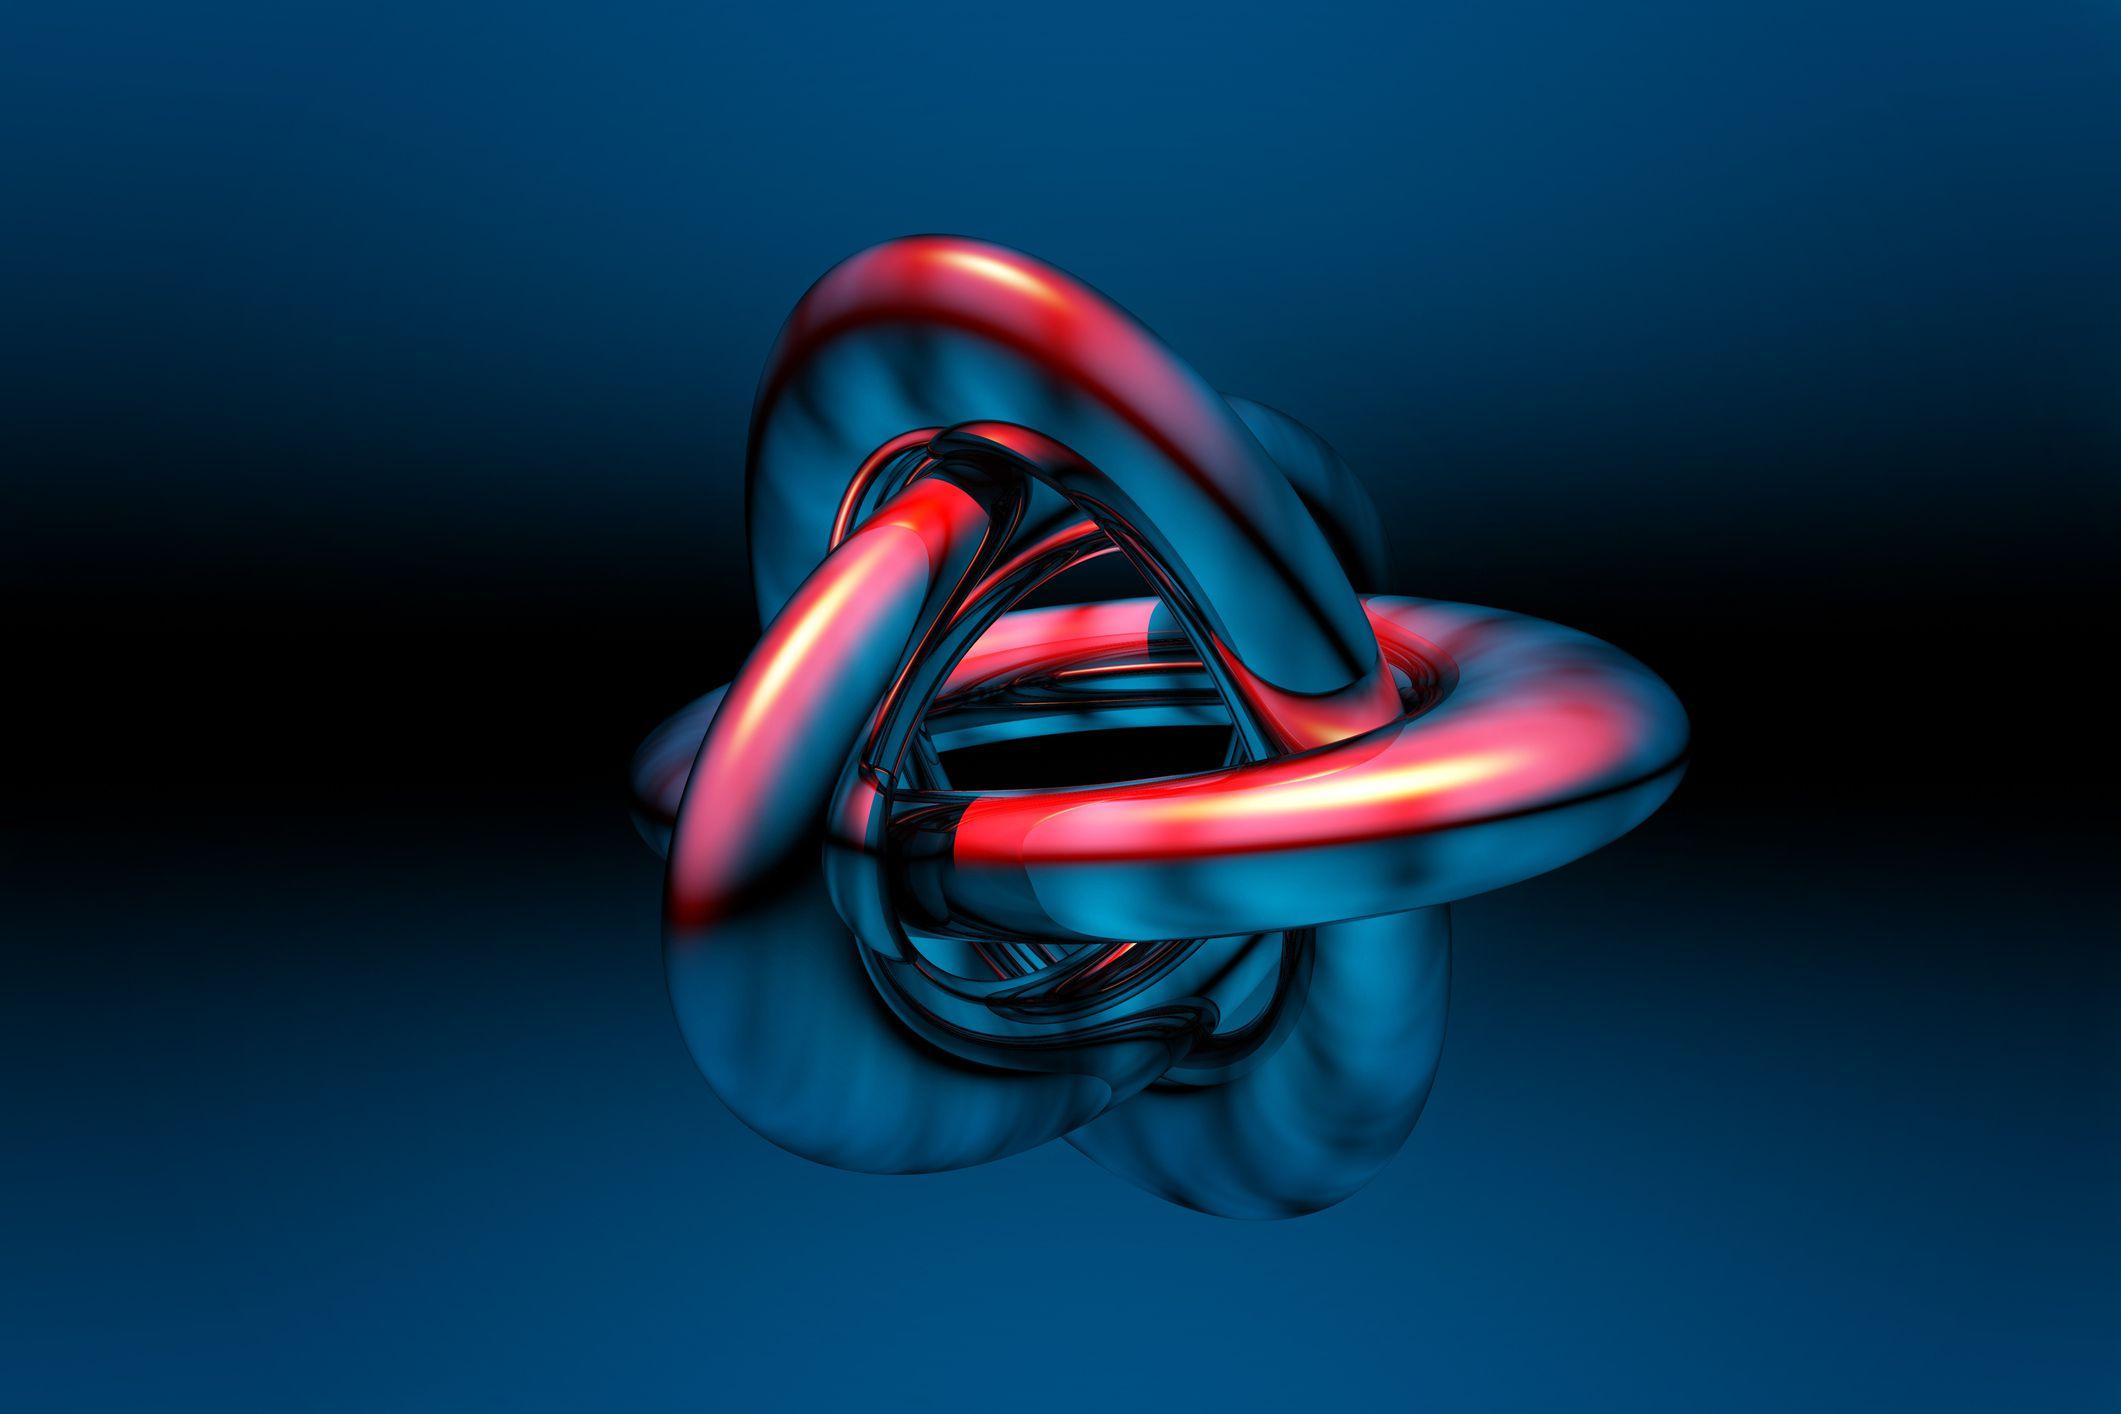 Borromean Rings, illustration